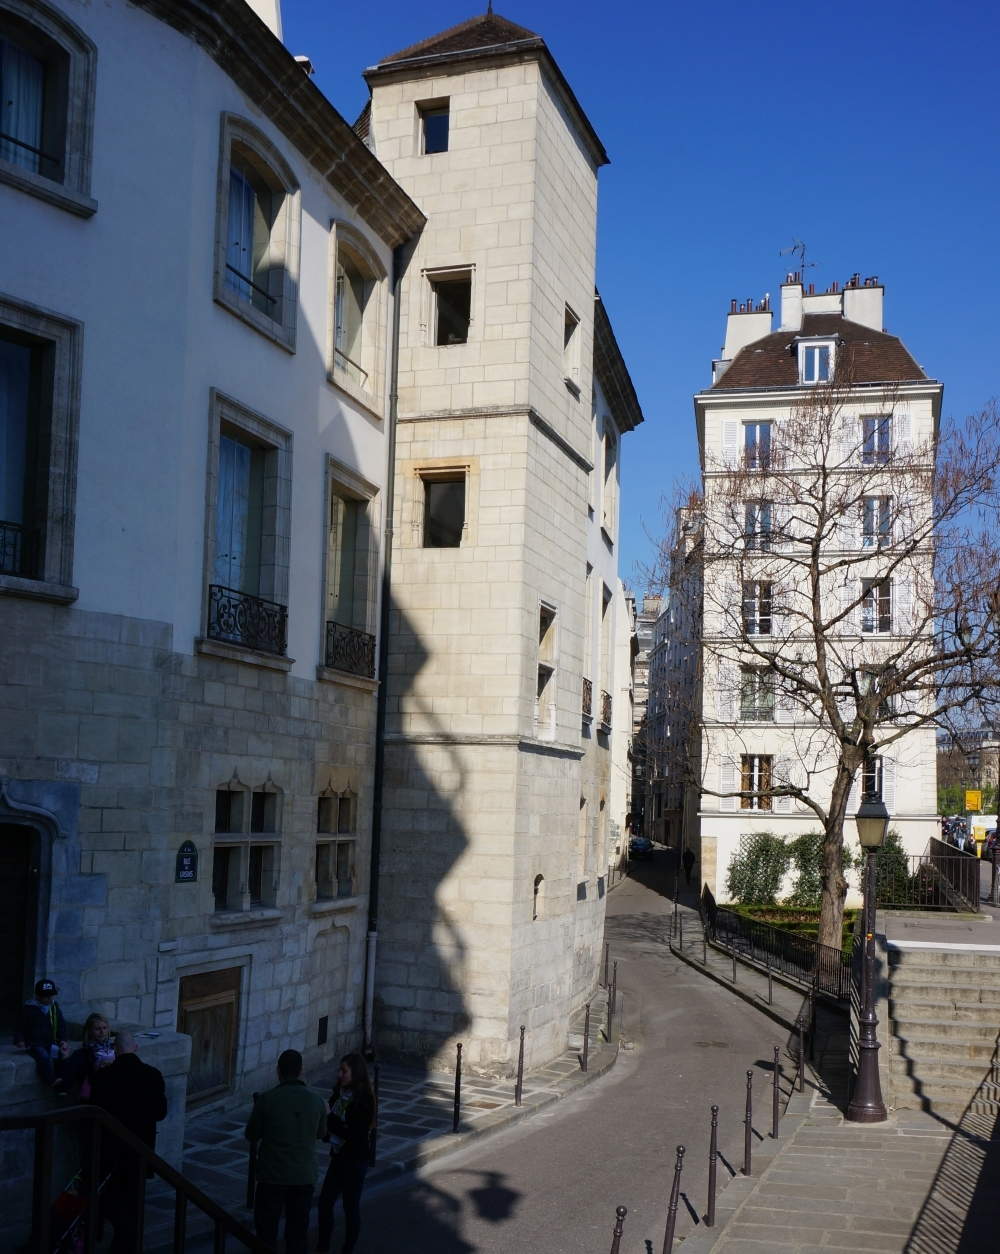 2014, ibidem.xyz ,rue des Ursins,rue des Ursins,Paris,France